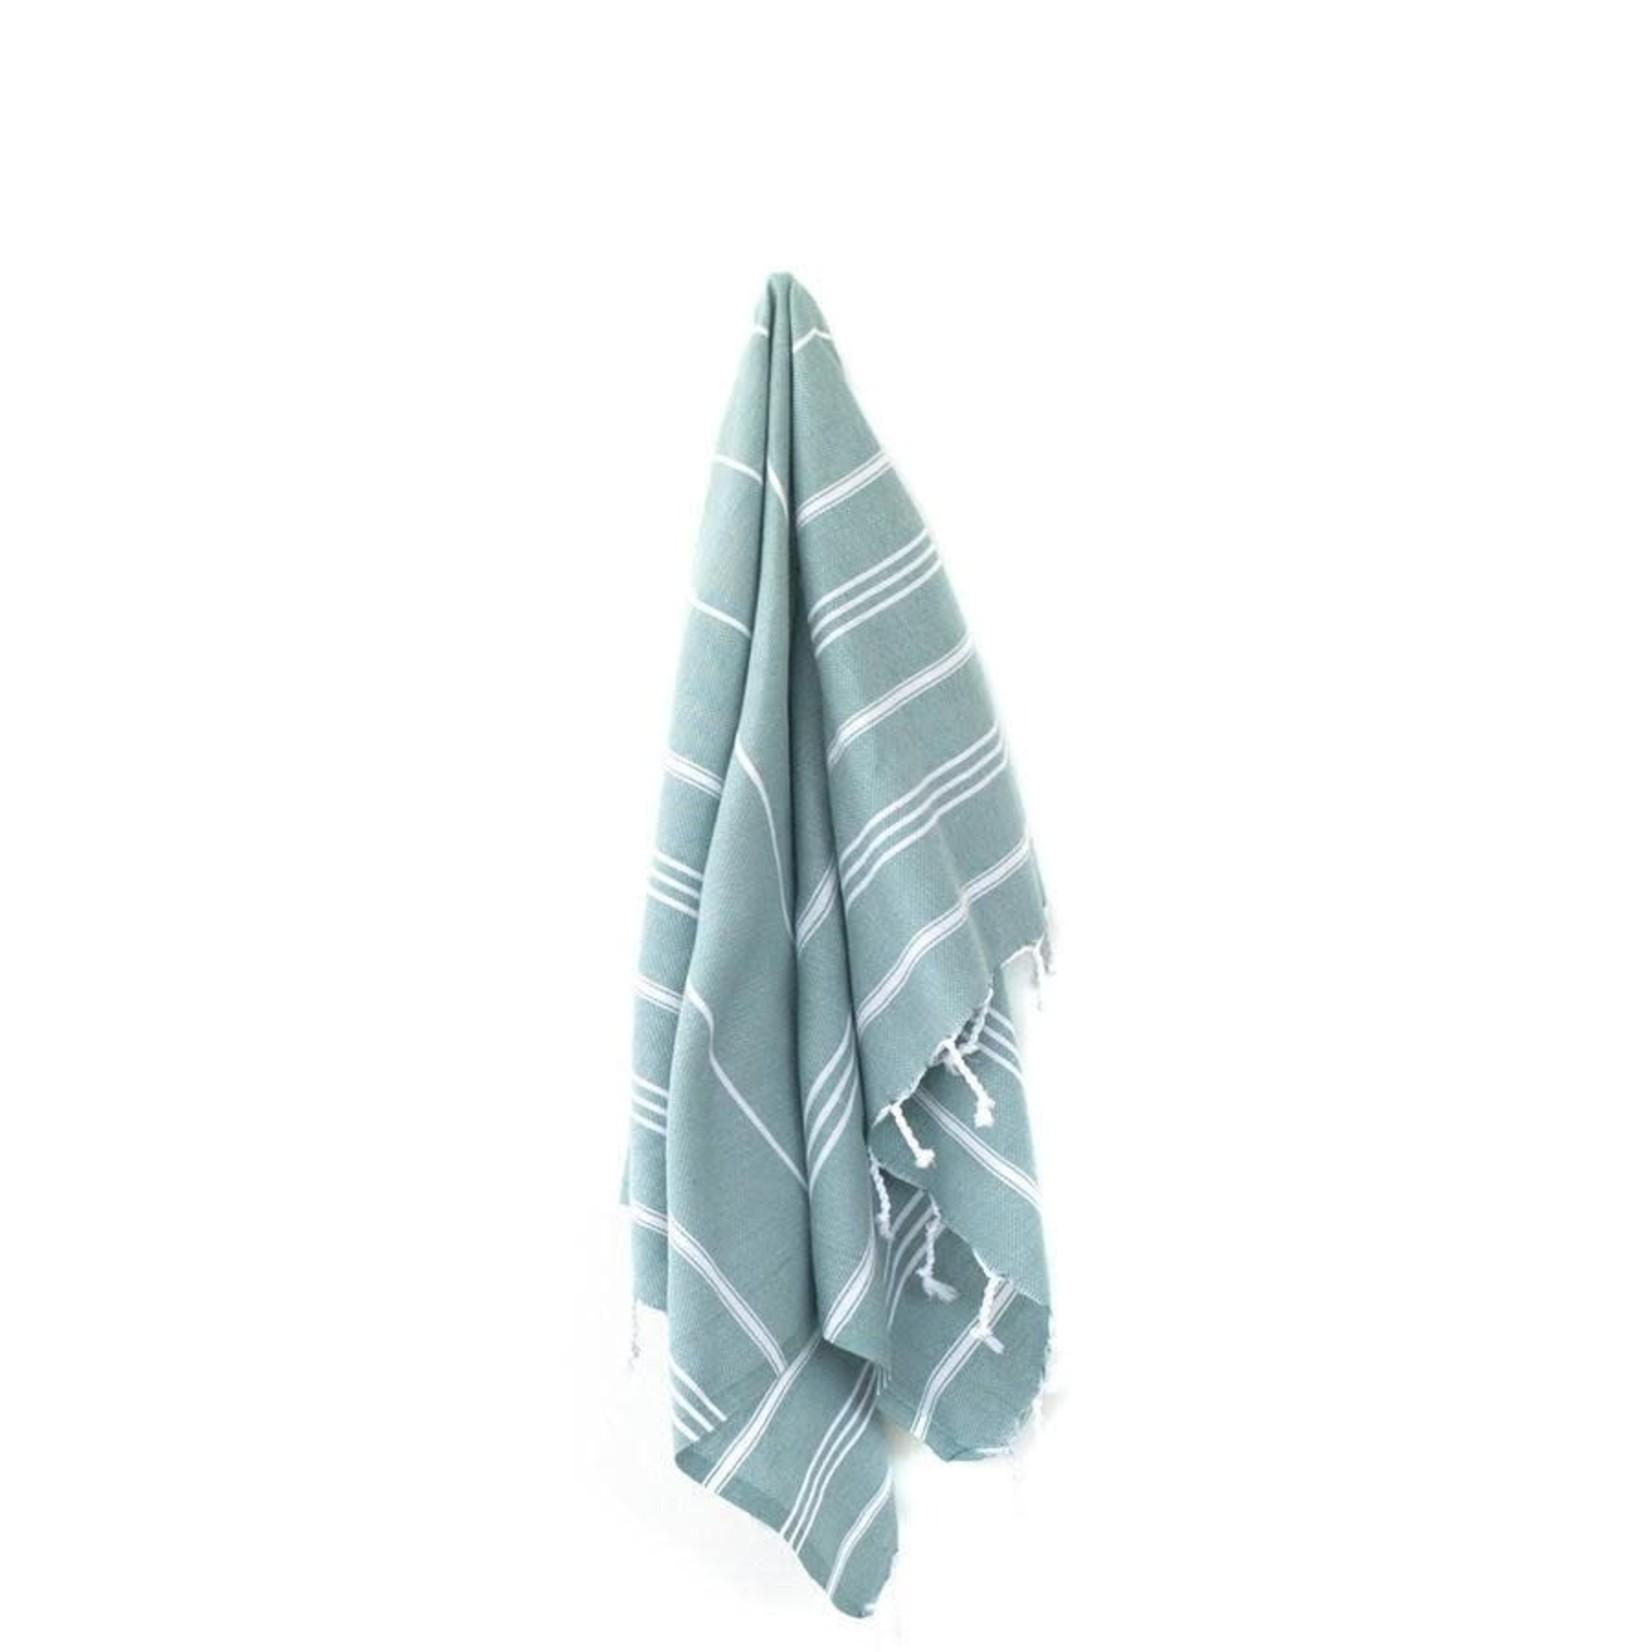 STRAY + WANDER MARIN SMALL TOWEL - GREEN